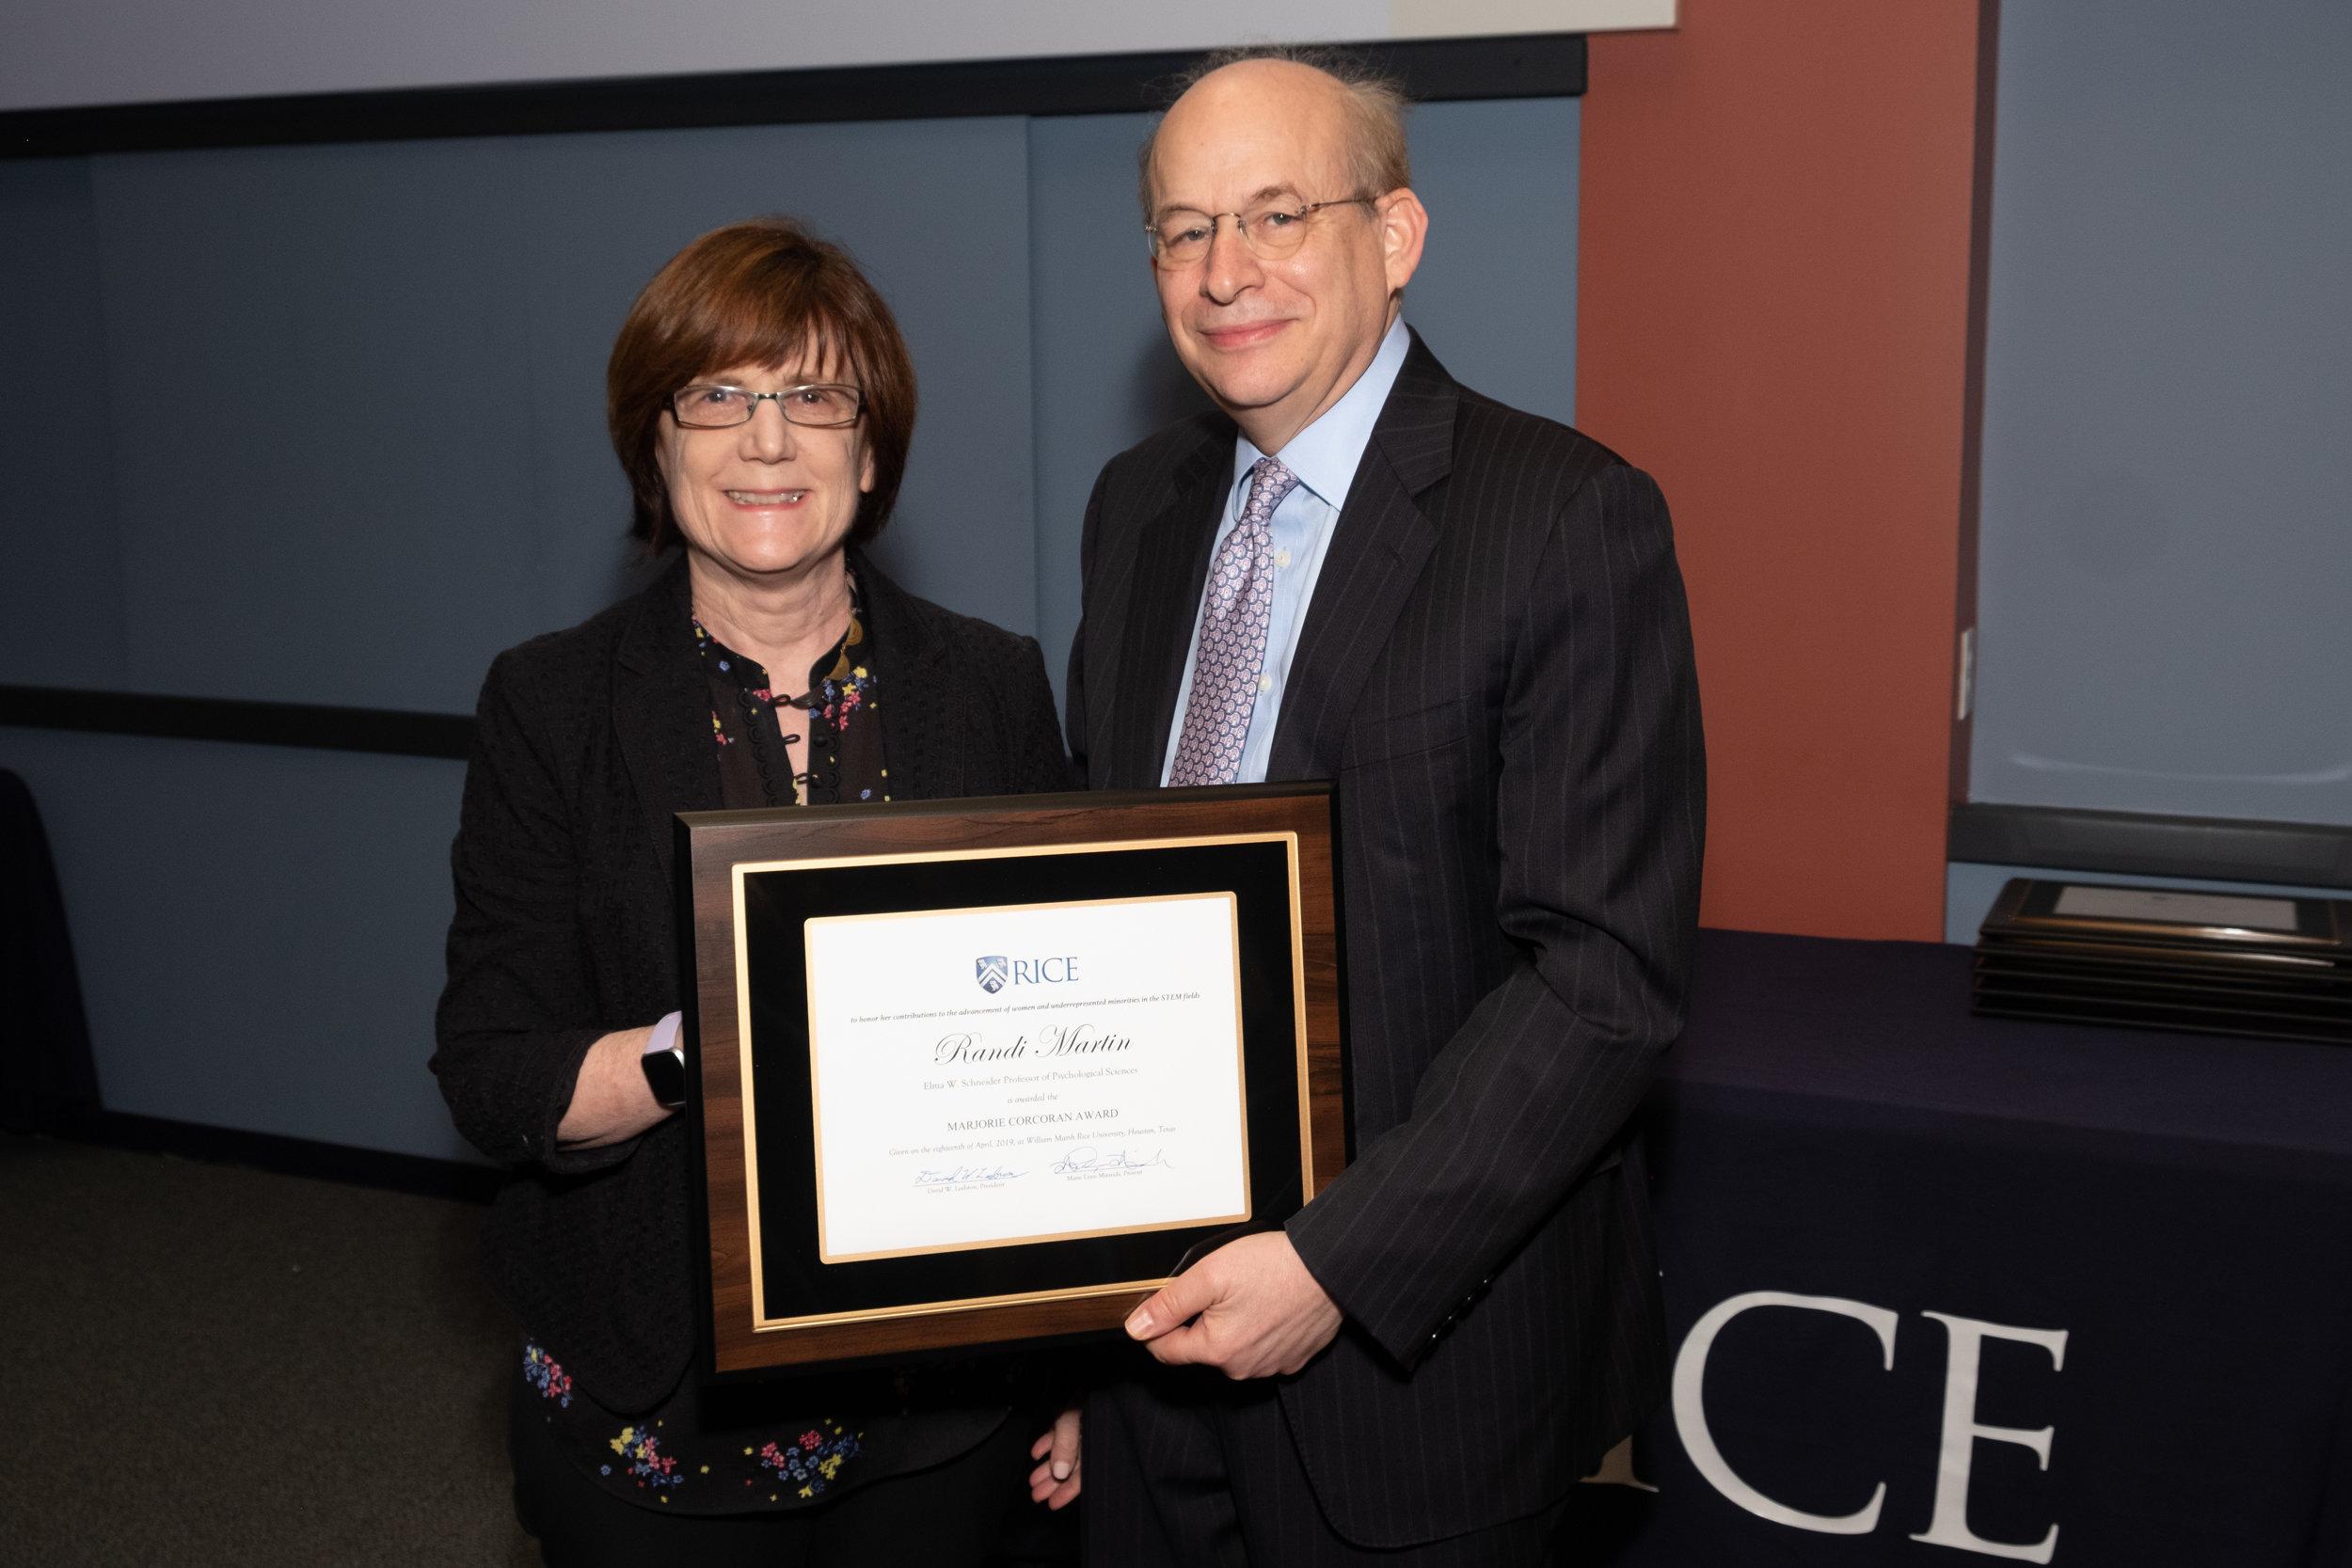 President Leebron & Randi Martin, Marjorie Corcoran Award